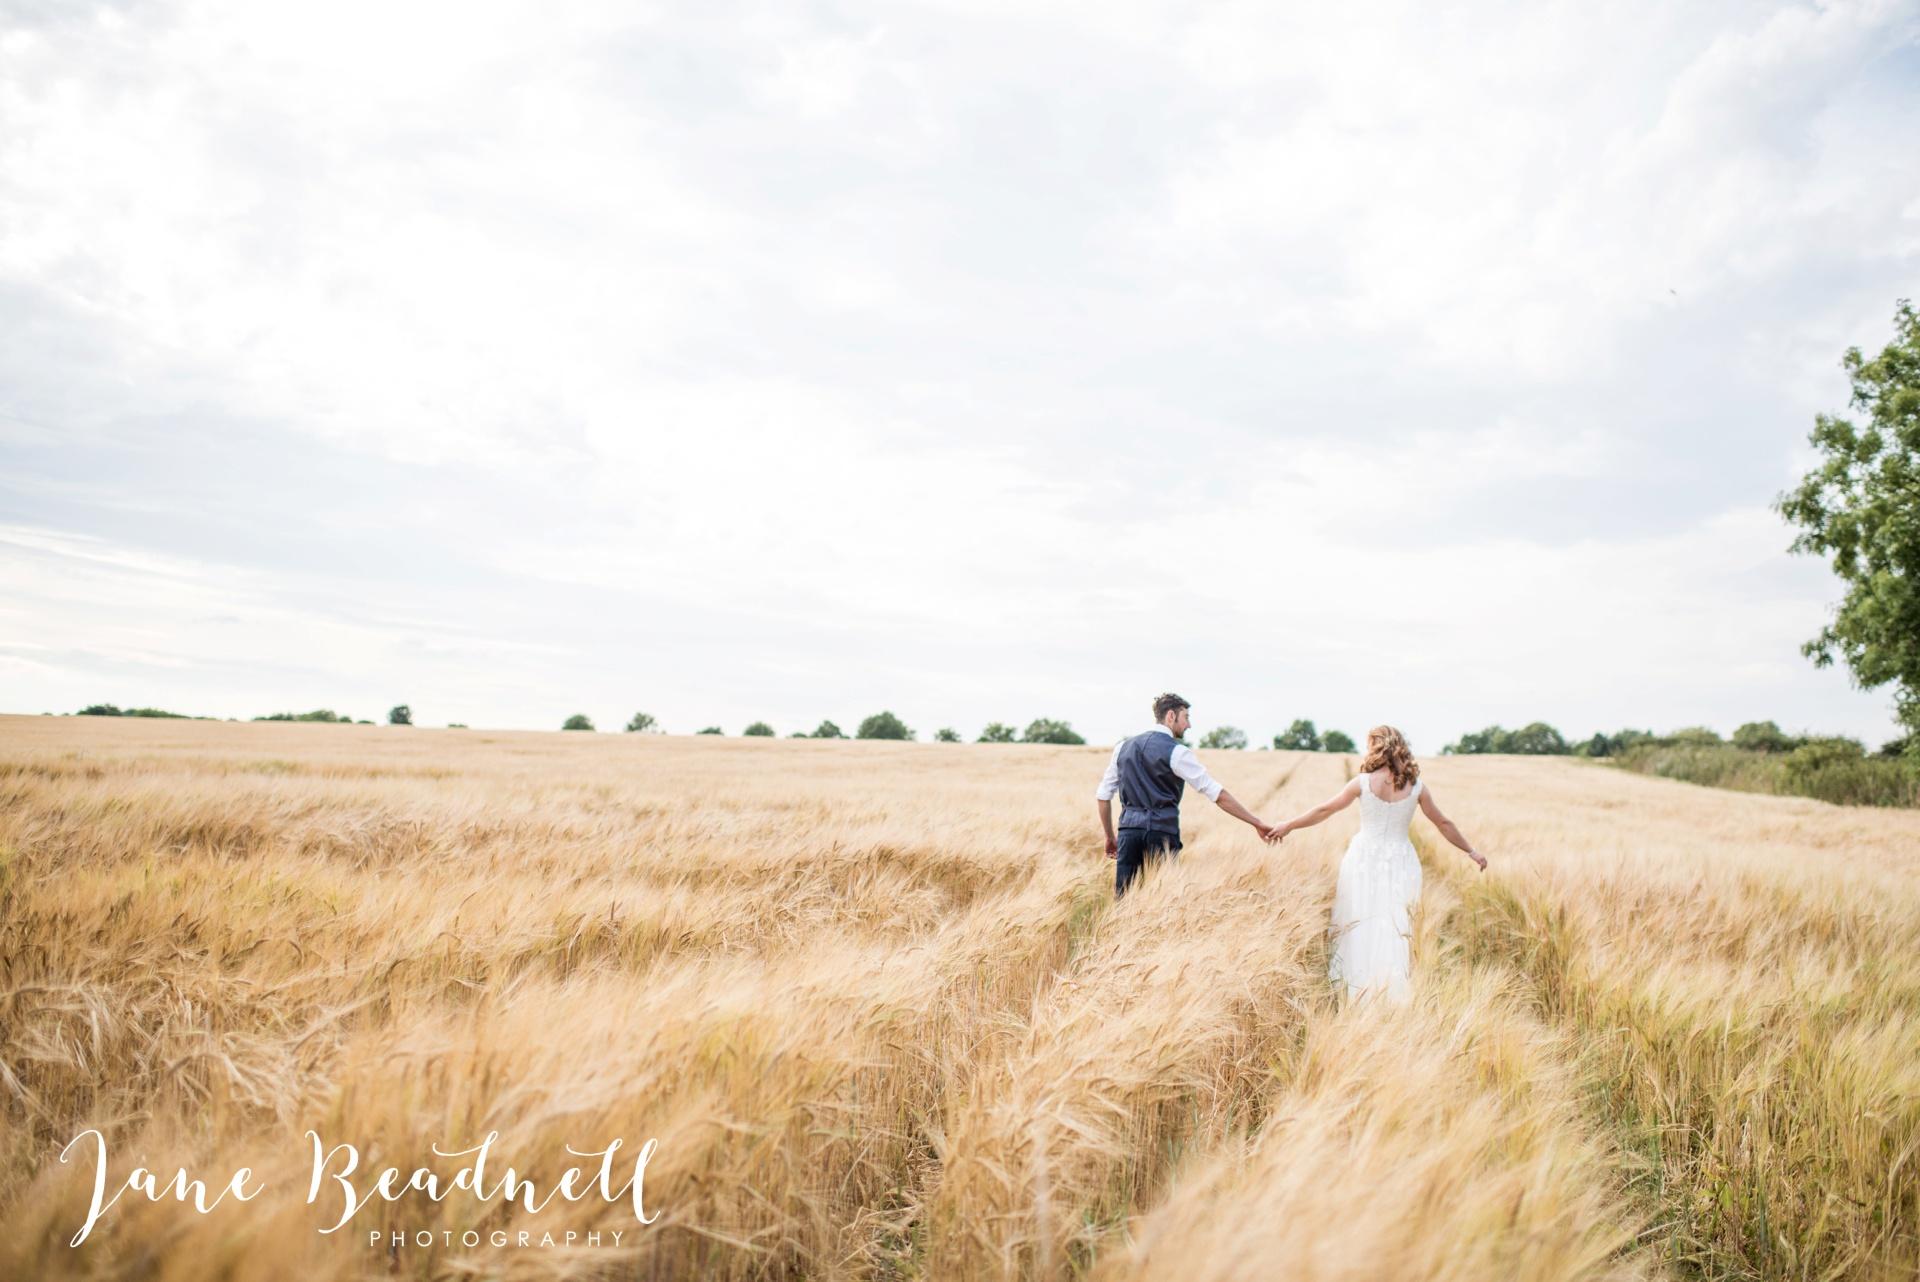 yorkshire-fine-art-wedding-photographer-jane-beadnell-photography-poppleton-york_0142